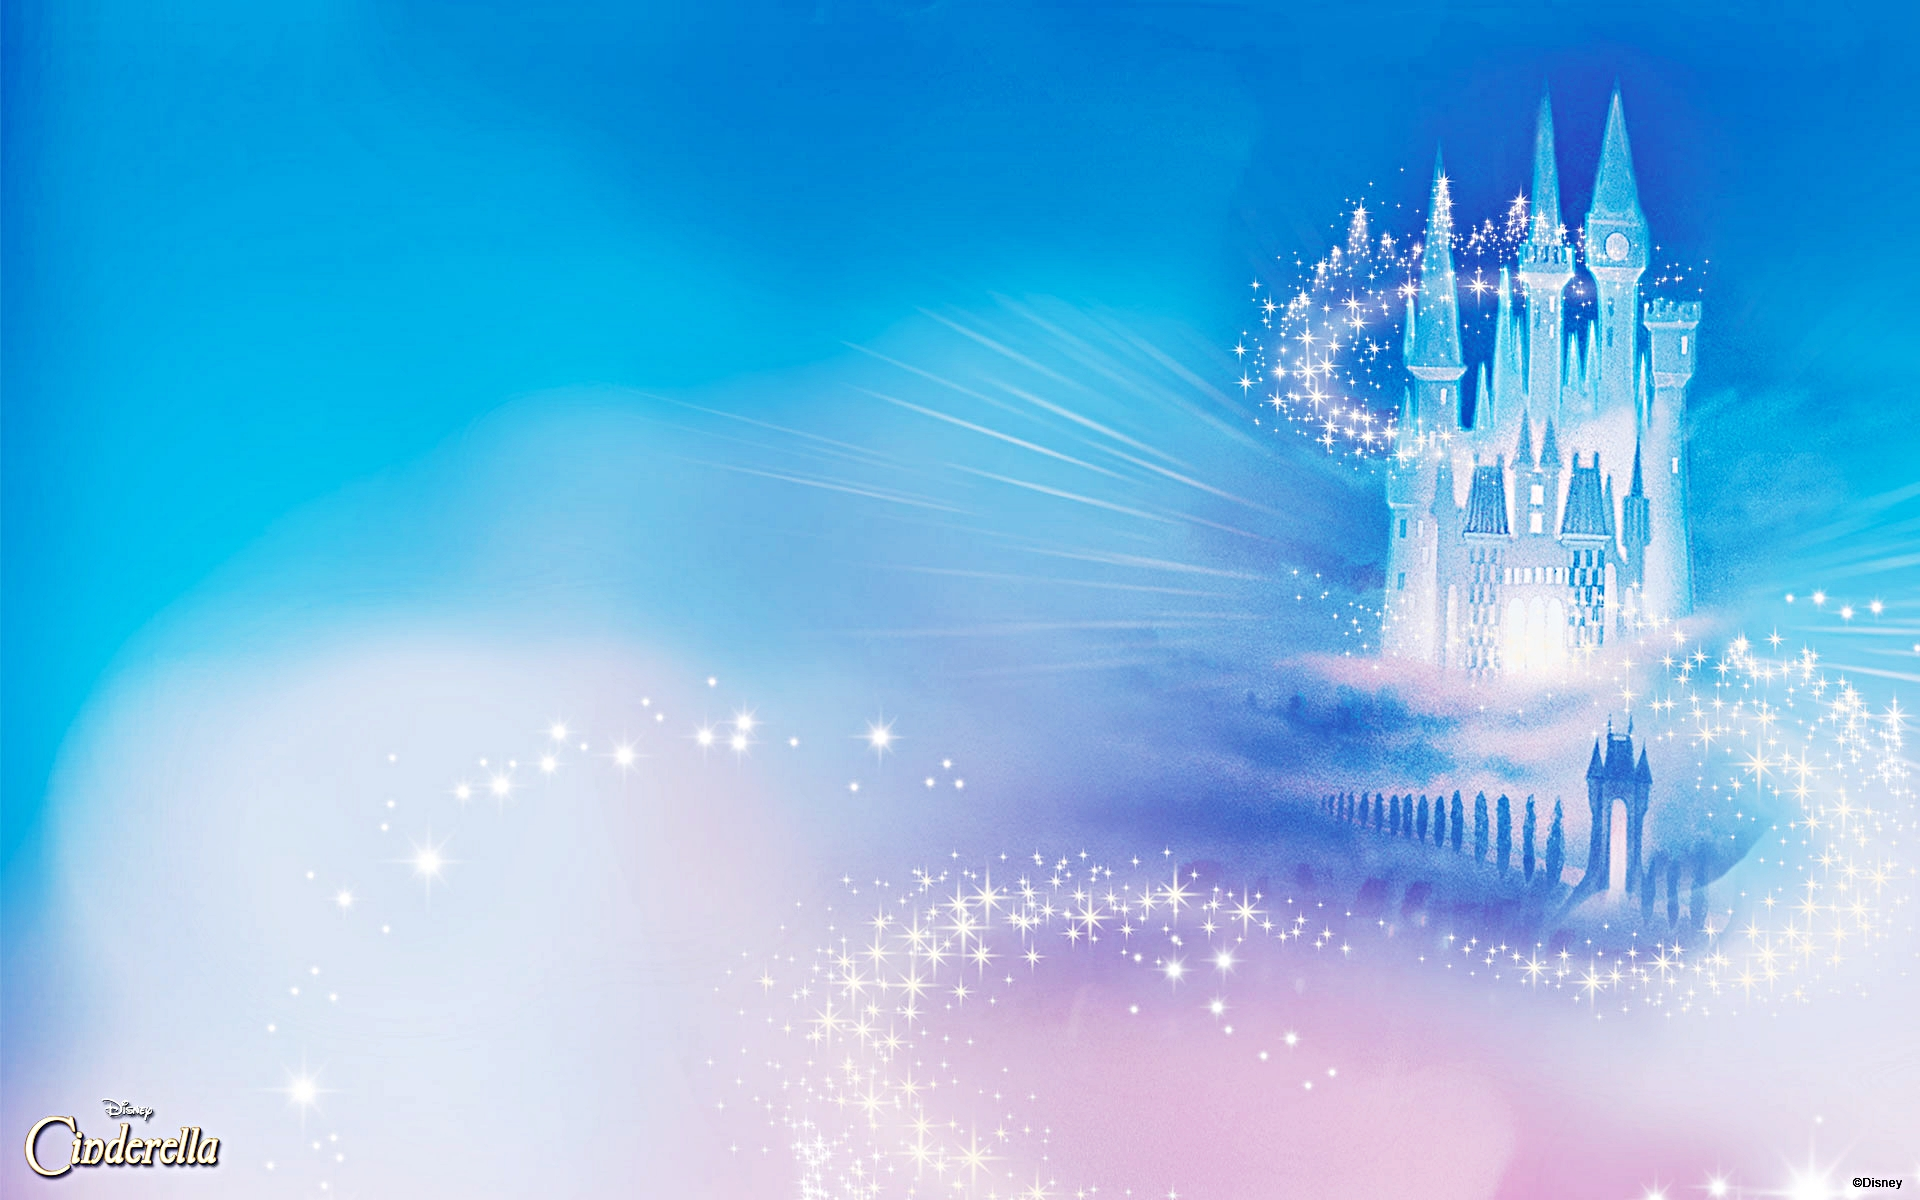 Cinderella Wallpaper Widescreen